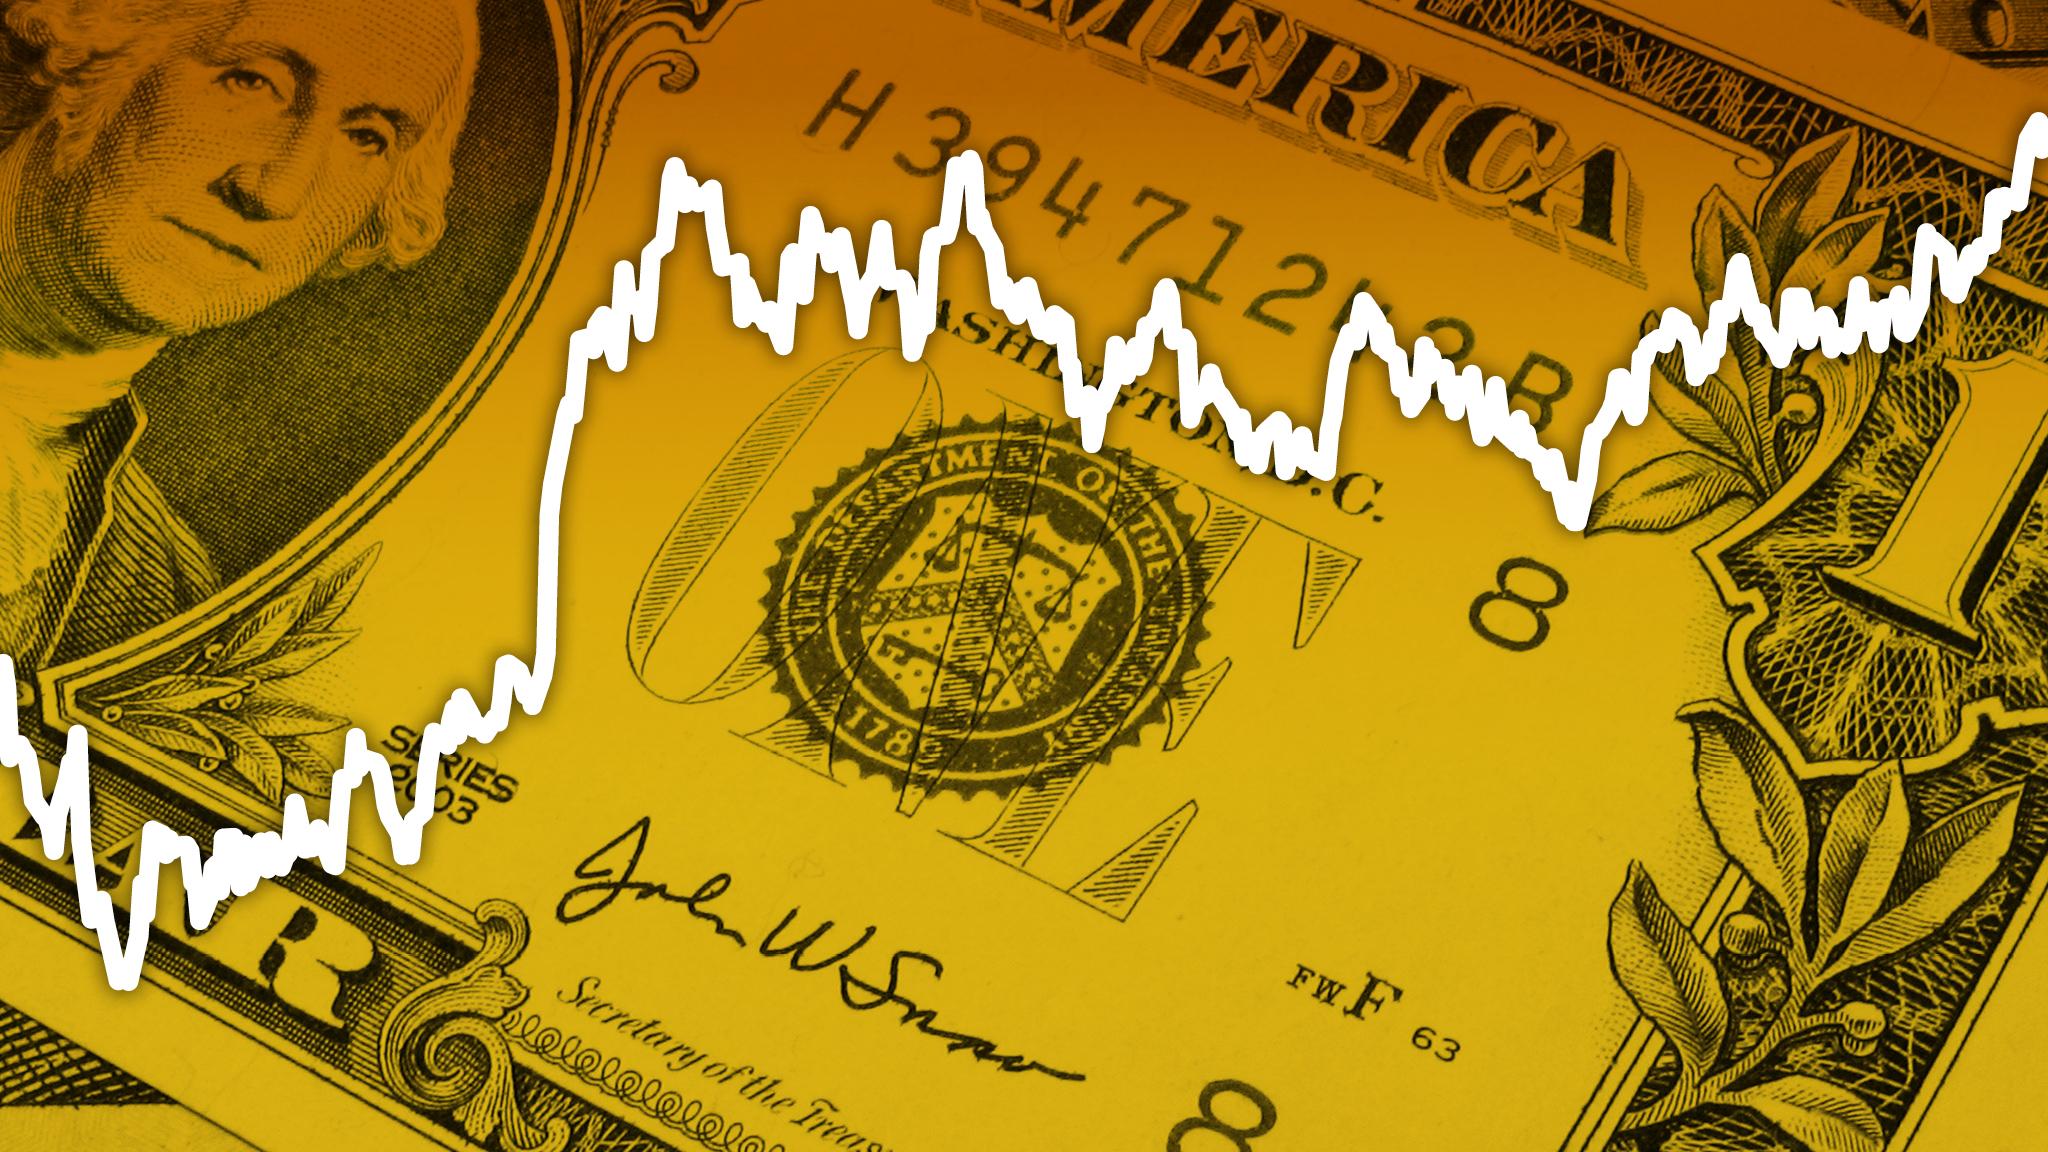 US bond market sell-off deepens